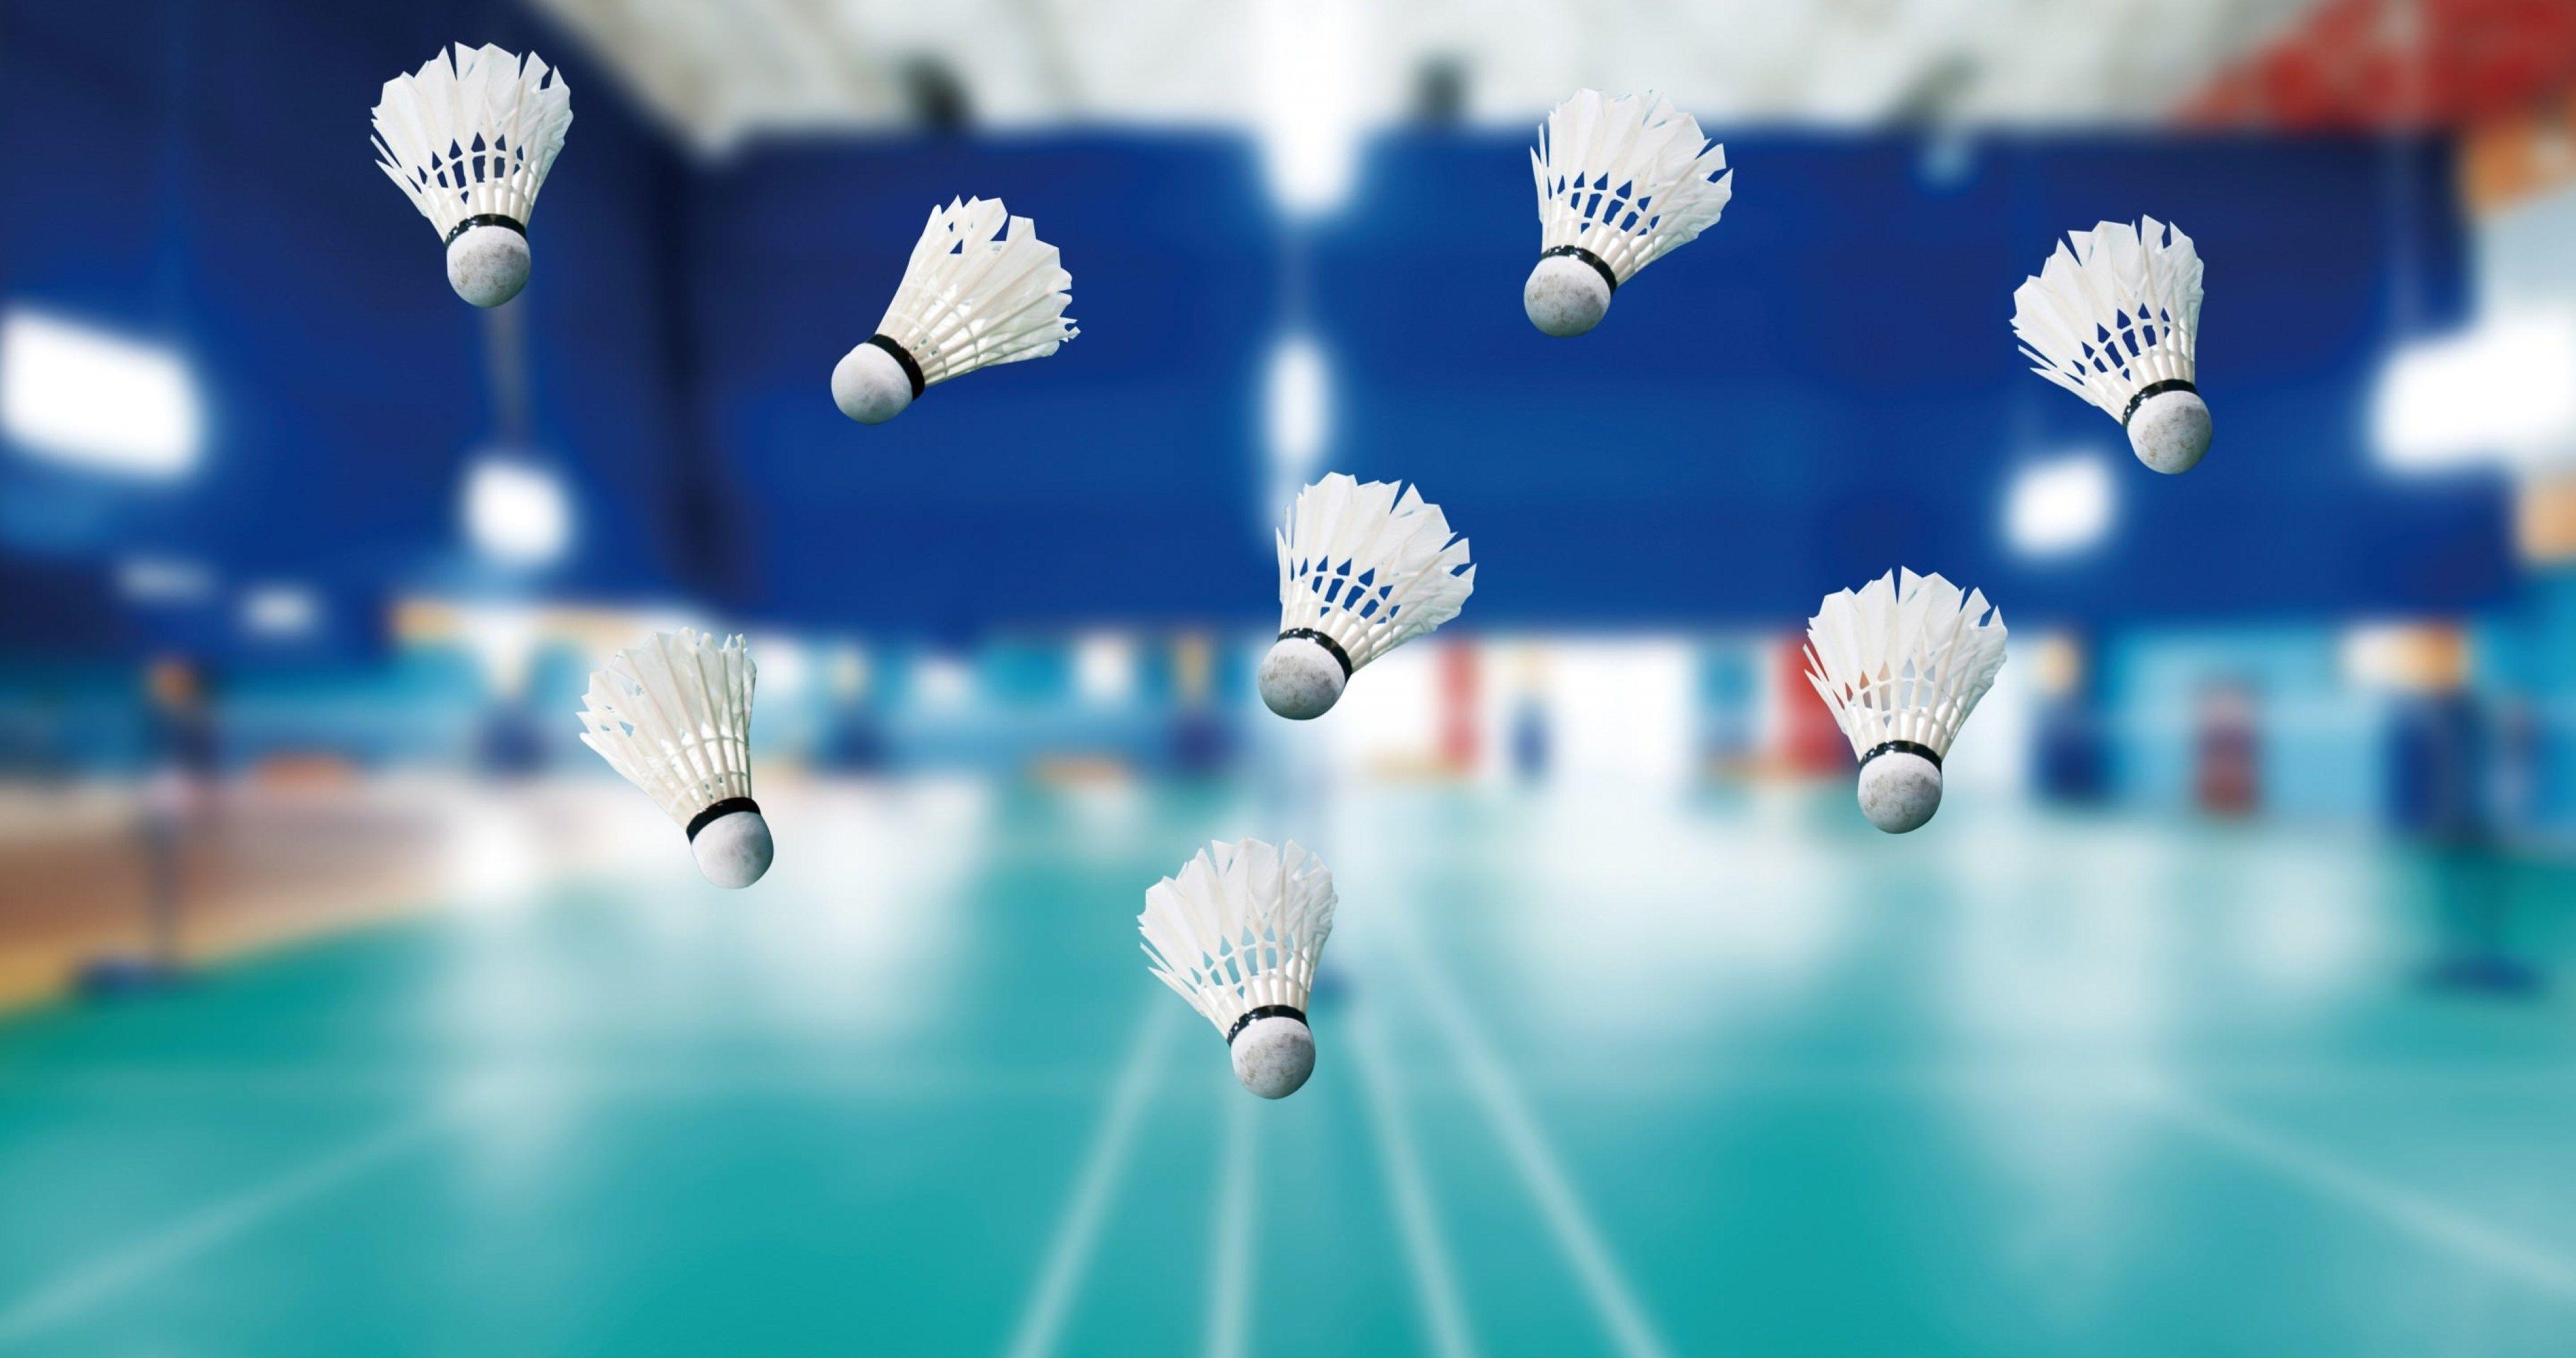 Badminton 4k Ultra Hd Wallpaper